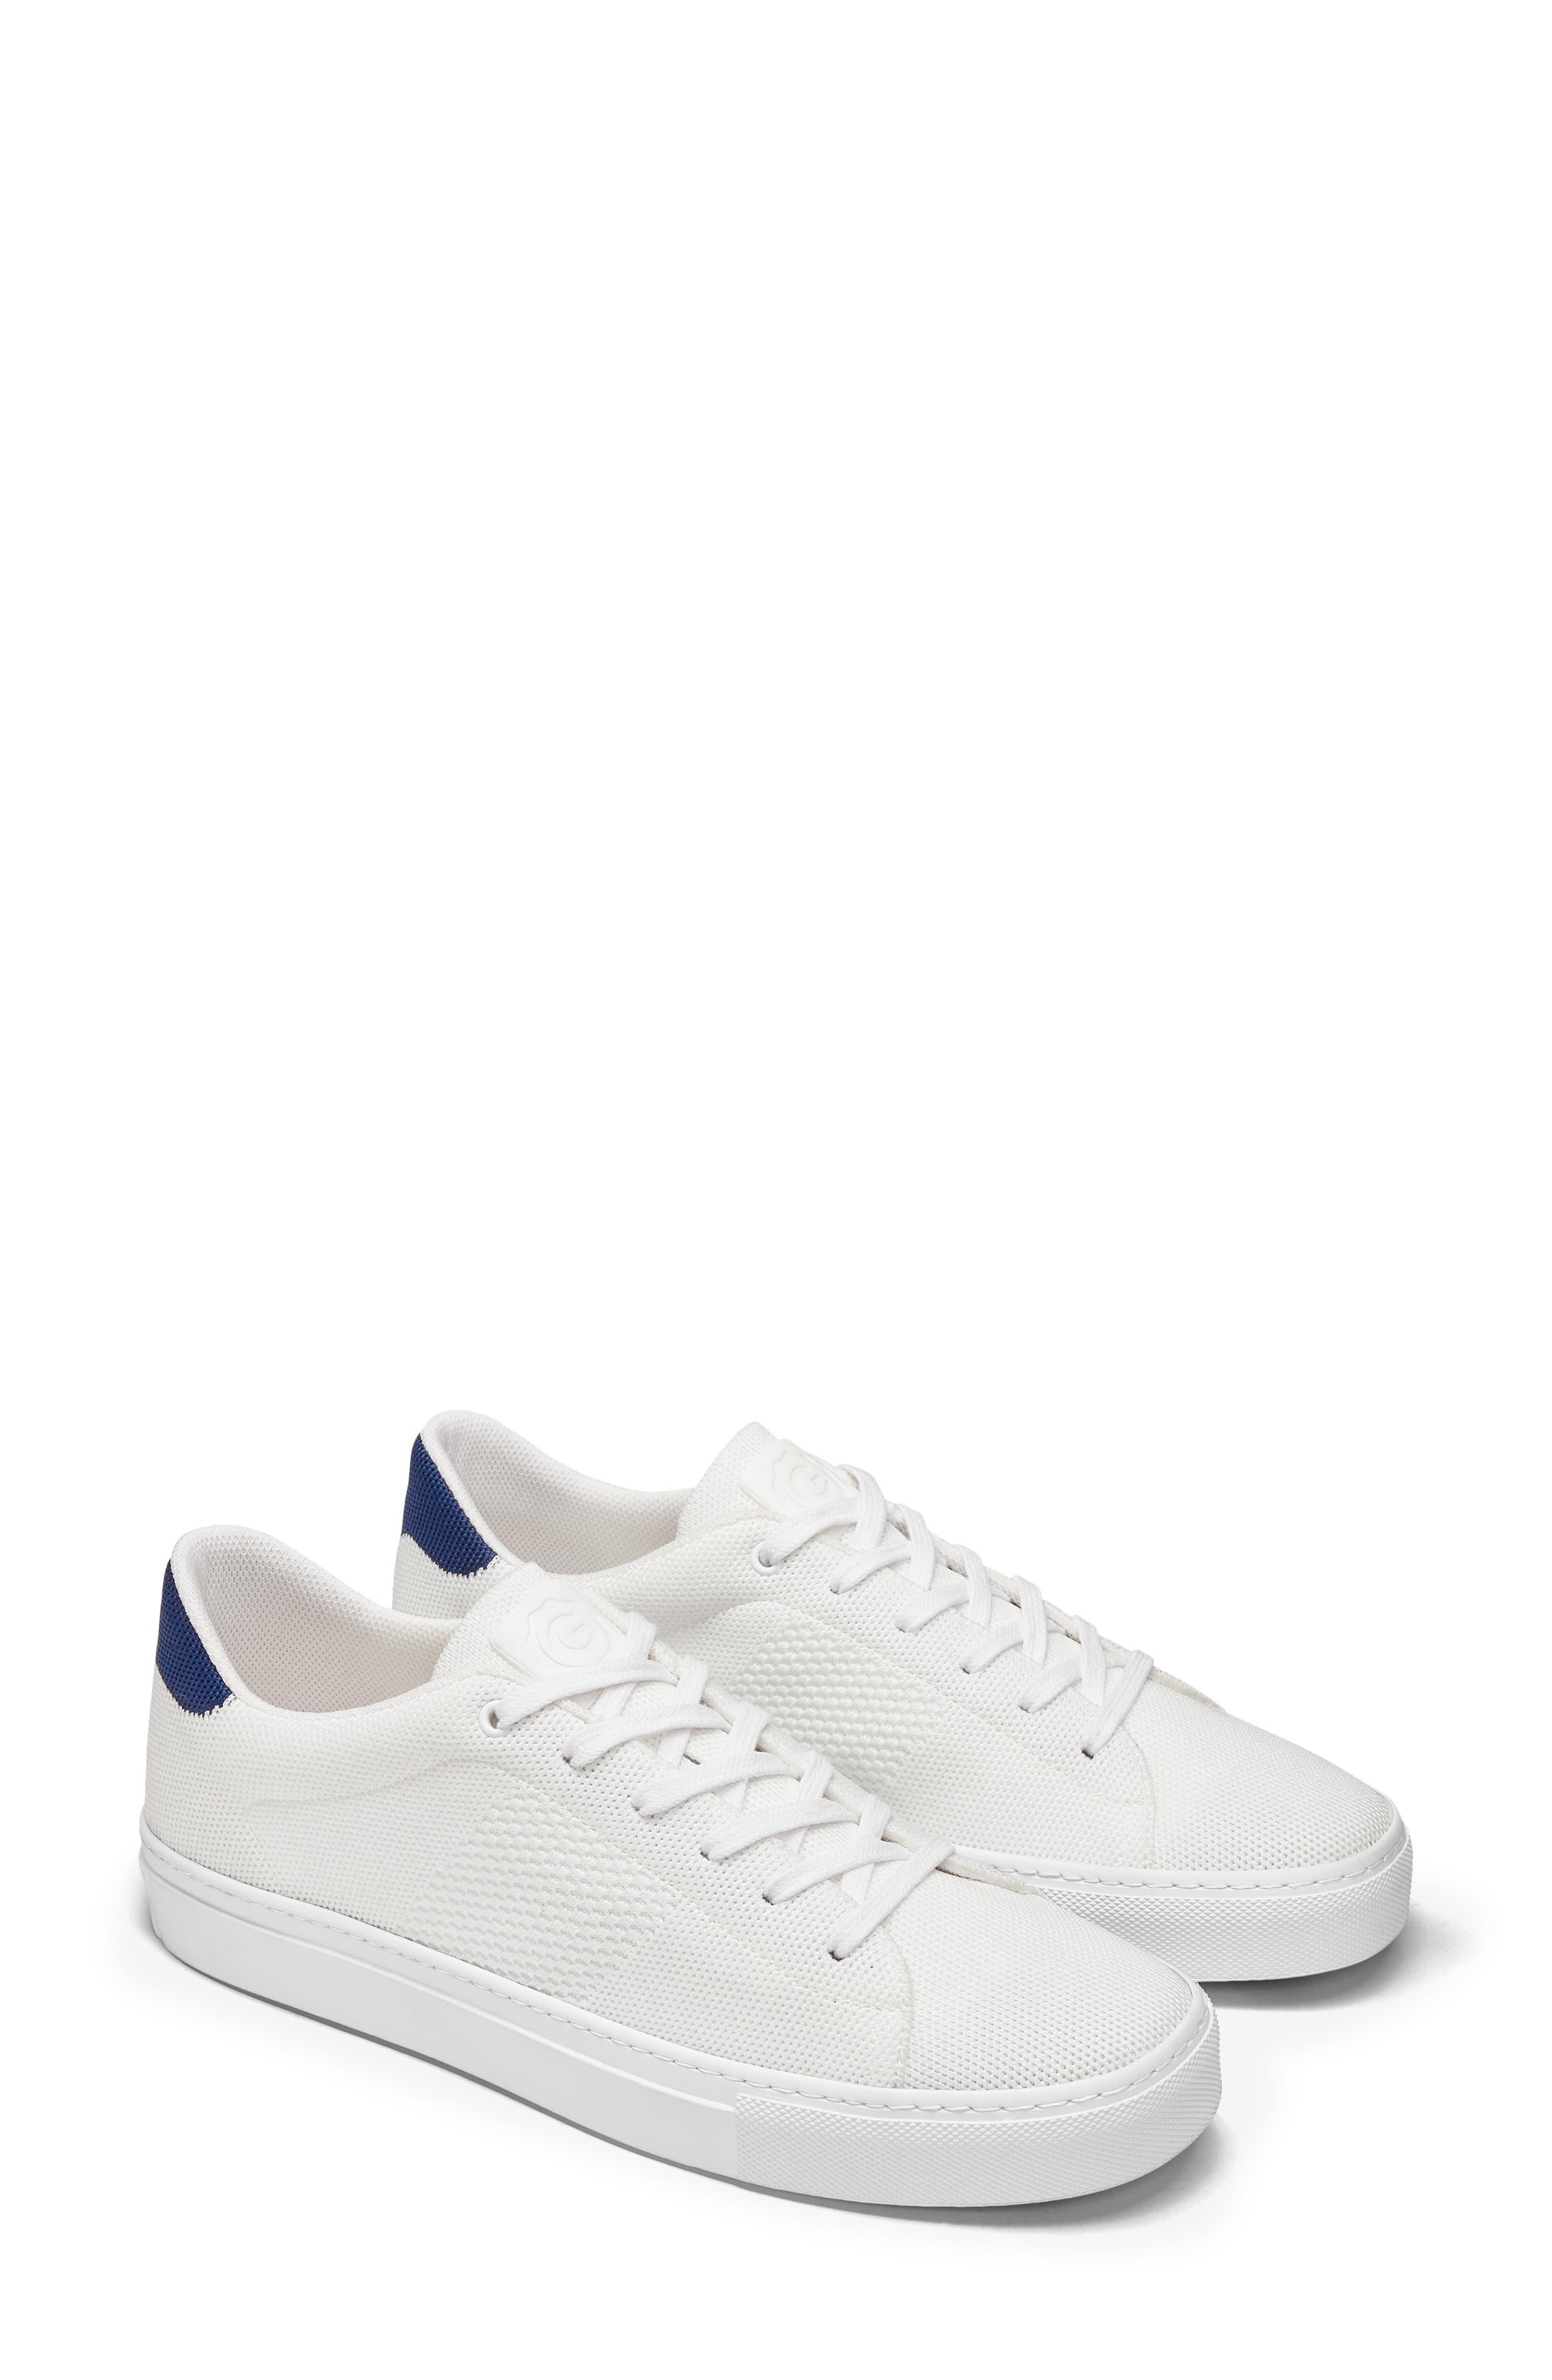 Royale Eco Sneaker